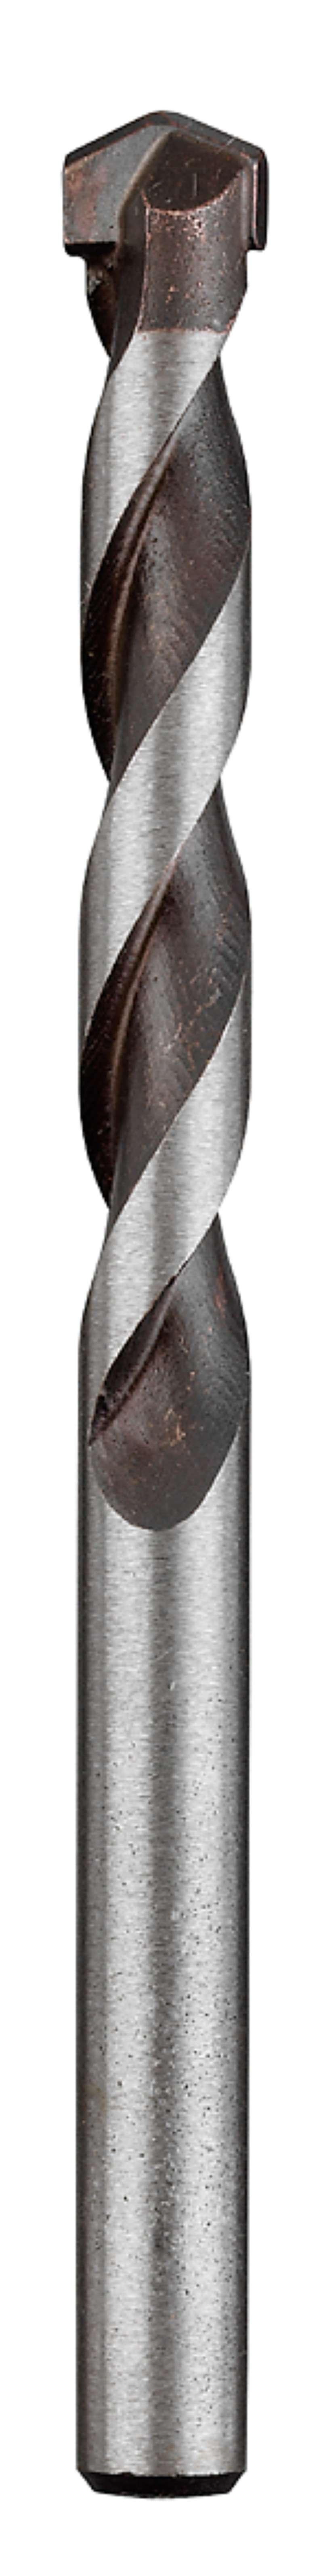 Сверло по камню Kwb 044-630 сверло по камню kwb 044 700